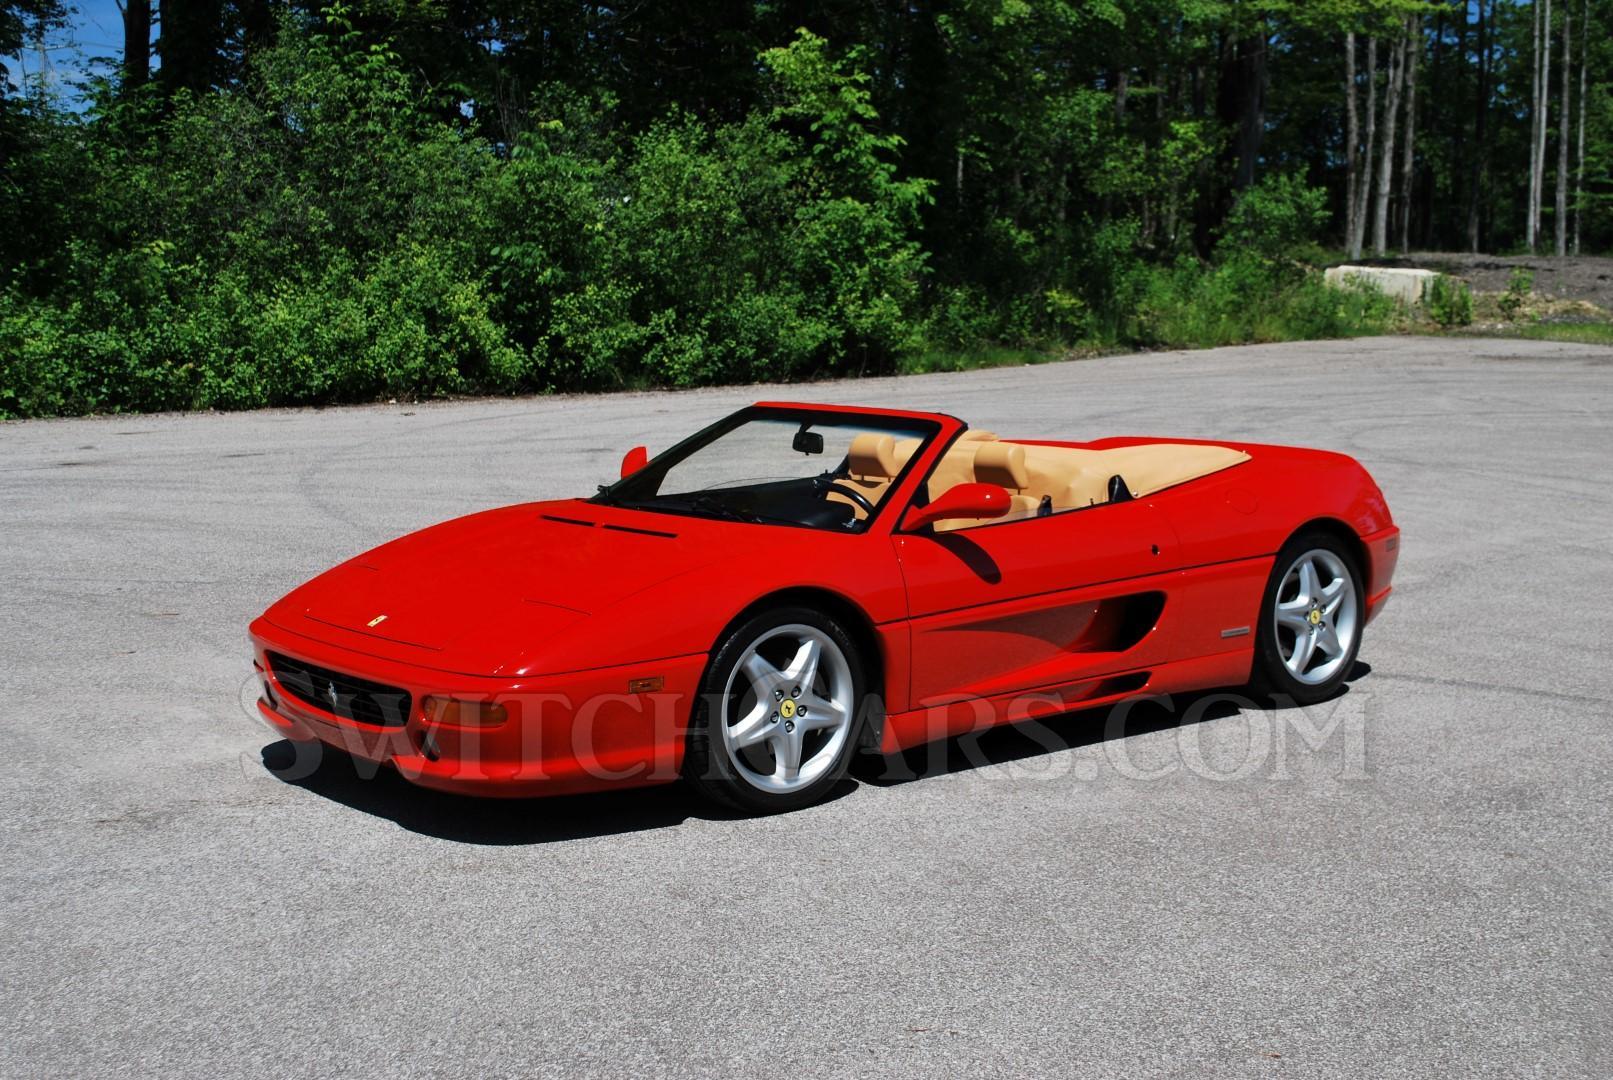 1998 Ferrari F355 Spider 6-speed Manual at Switchcars Inc ...